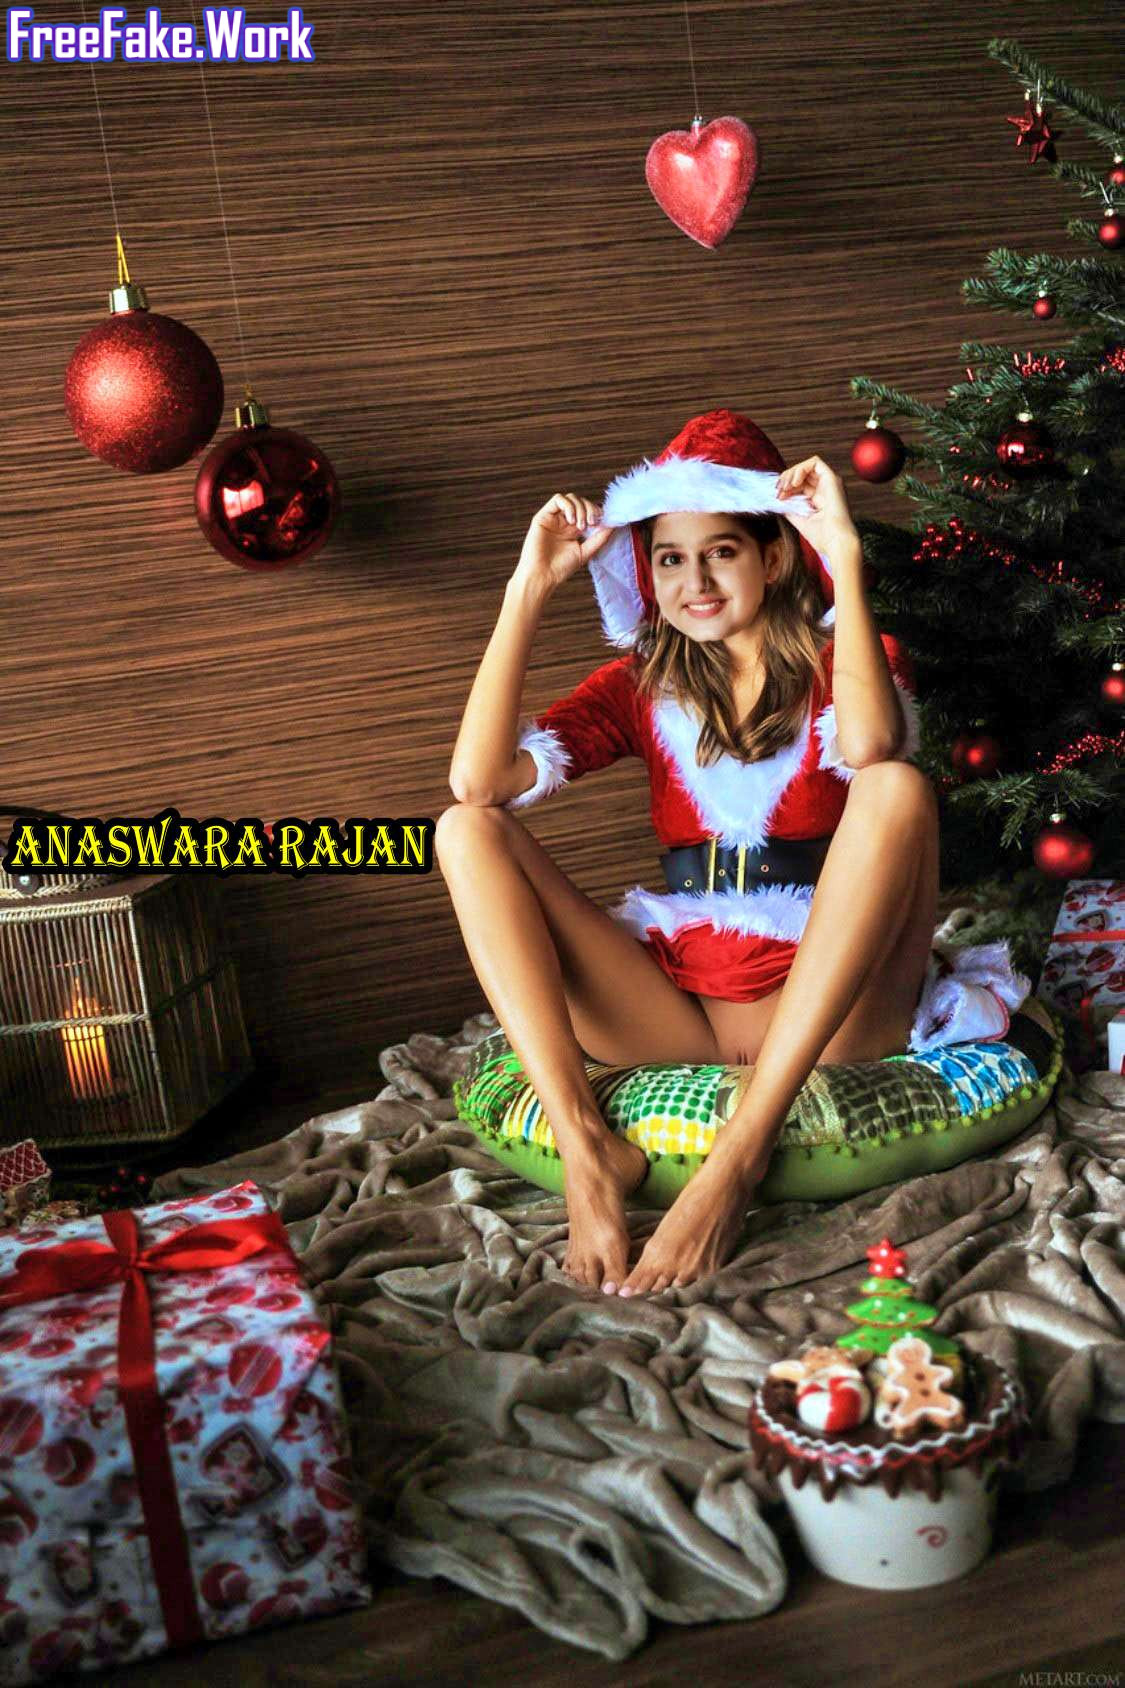 Anaswara-Rajan-sexy-leg-pen-shaved-pussy-Christmas-special.jpg